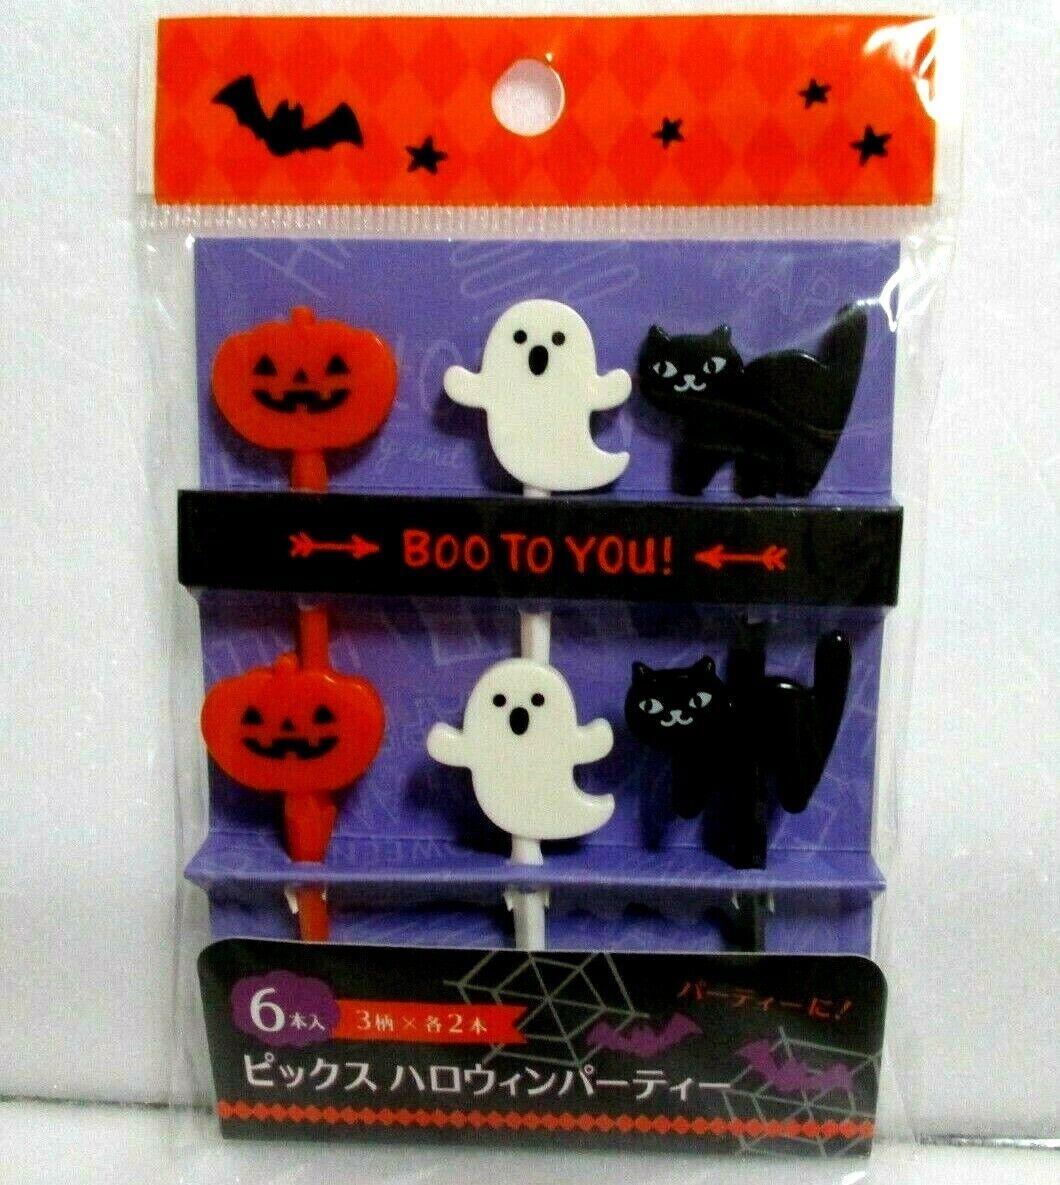 Halloween Japanese Food Picks 6pcs fPumpkin Black Cat Lunch